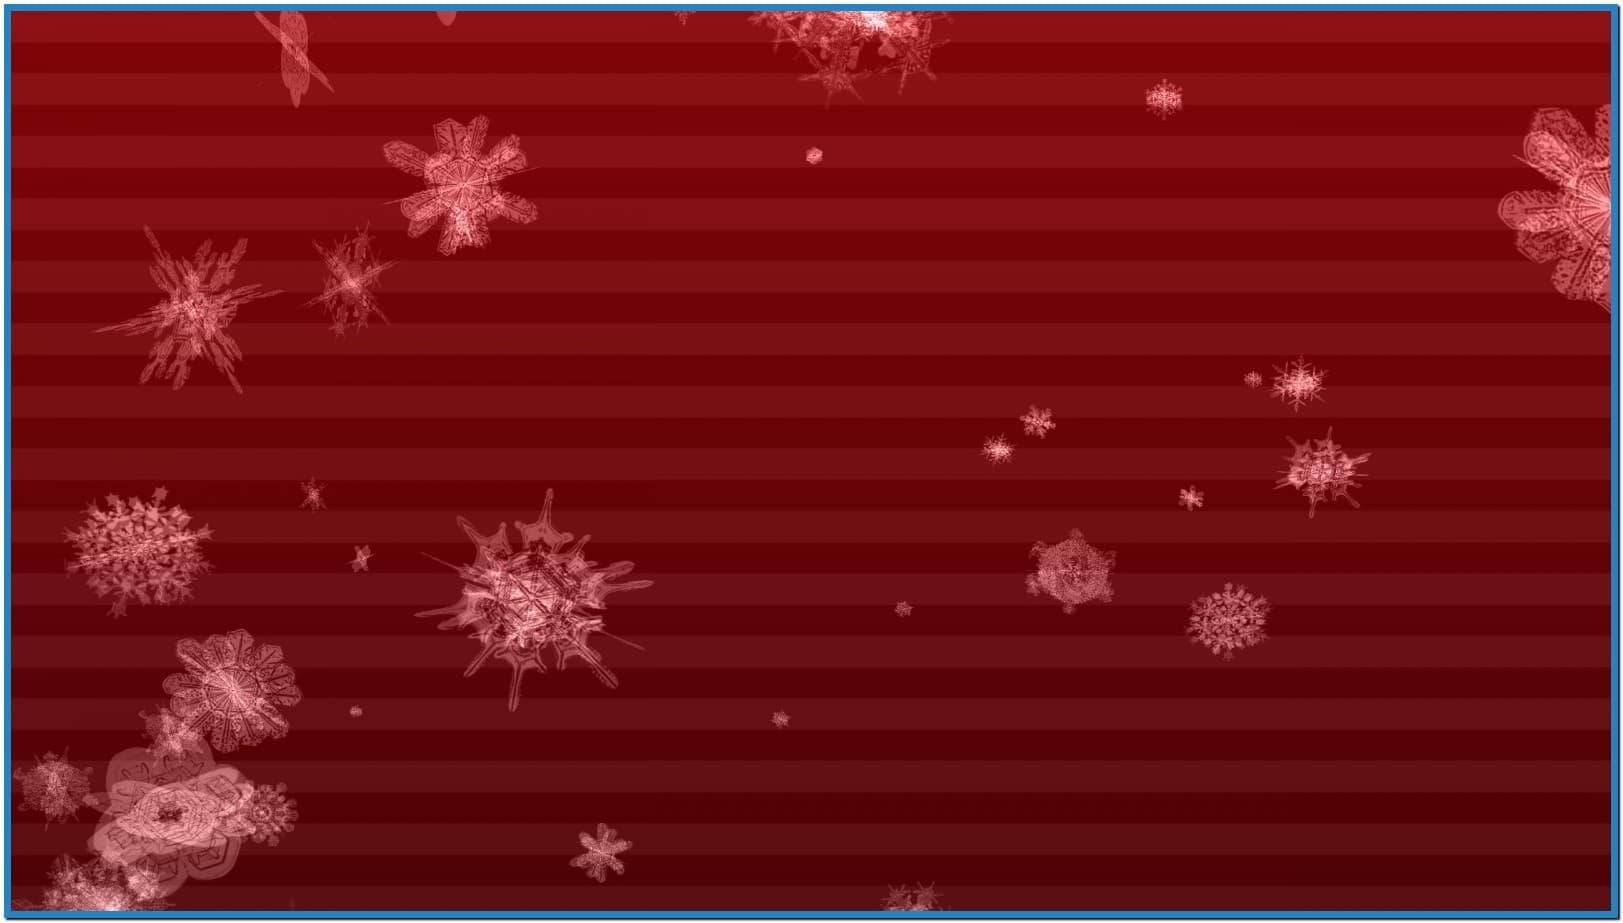 holiday screensavers and wallpaper mac jpg3jpg 1623x923